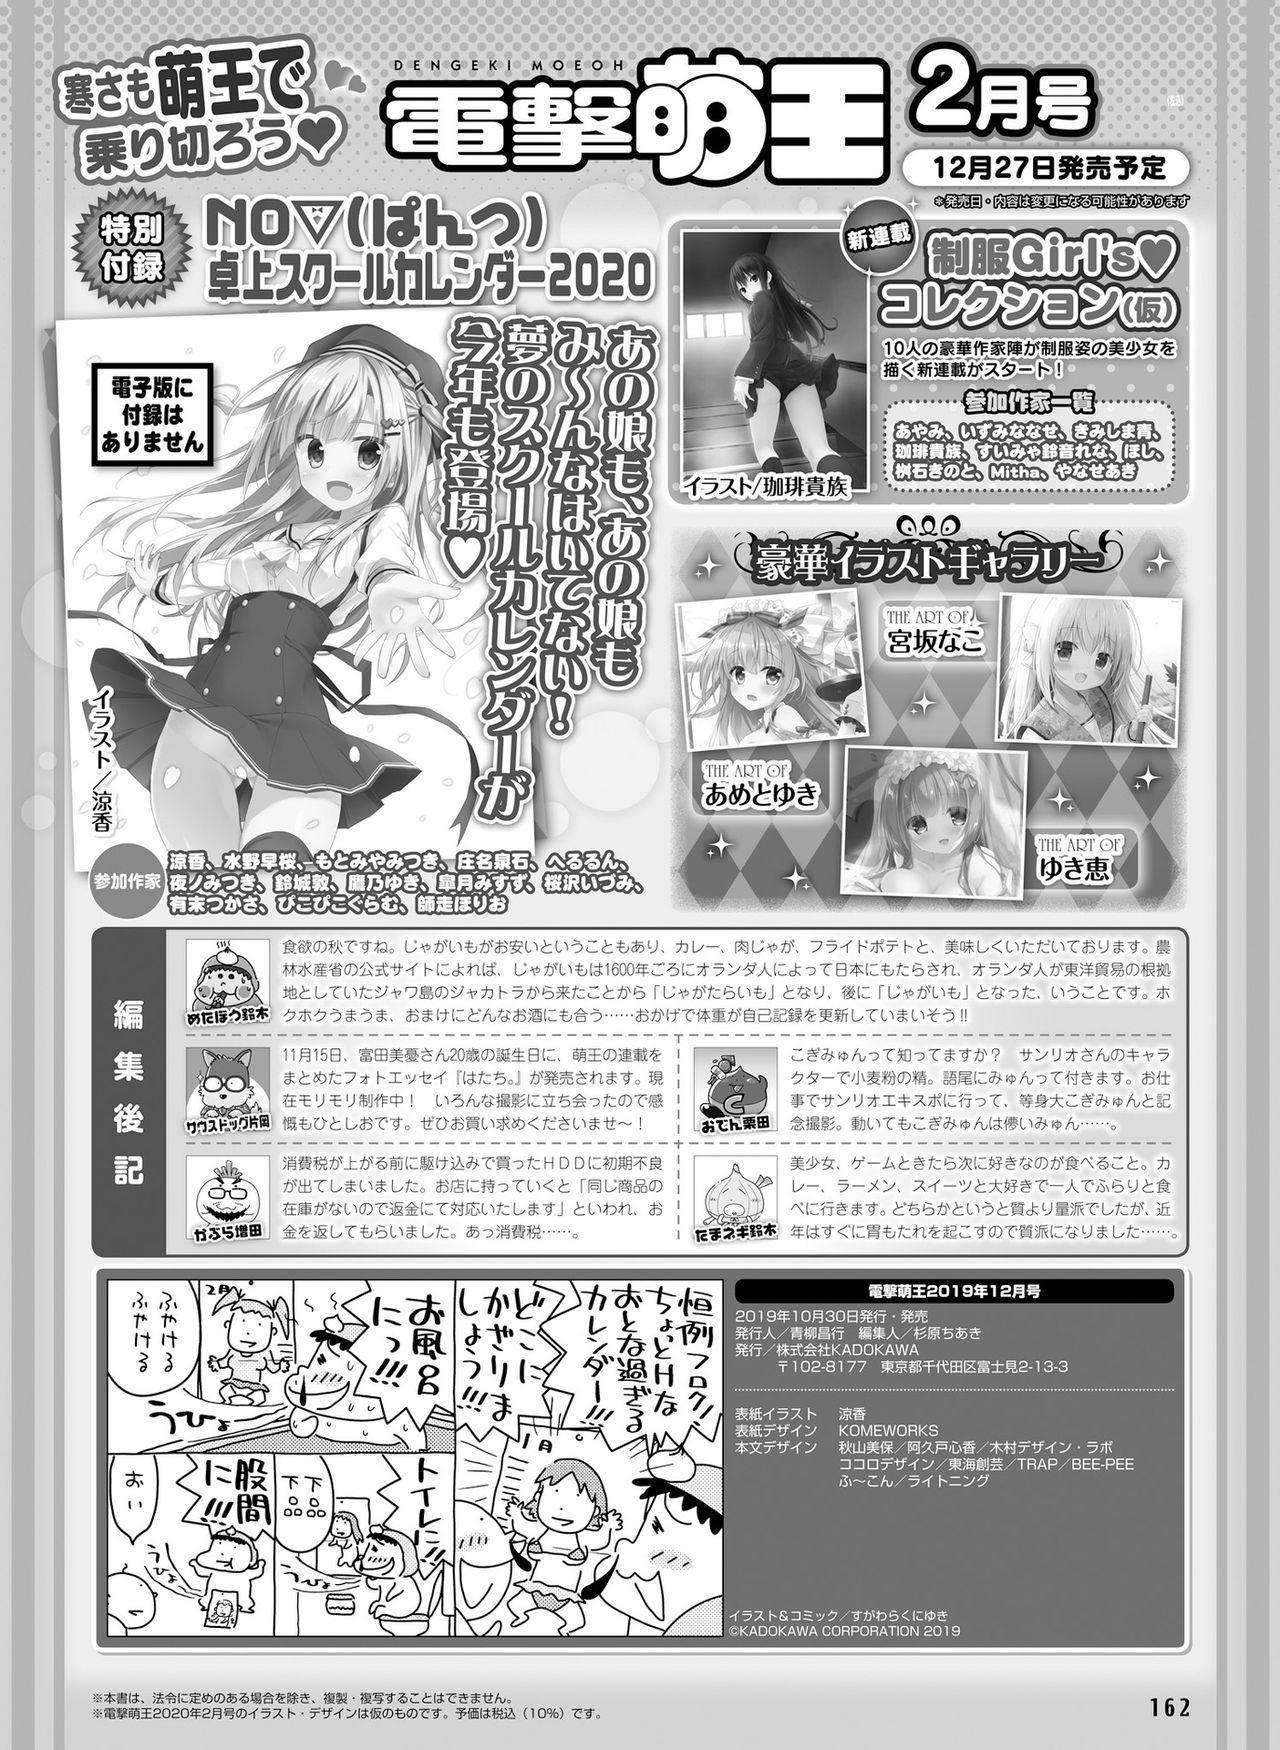 Dengeki Moeoh 2019-12 149